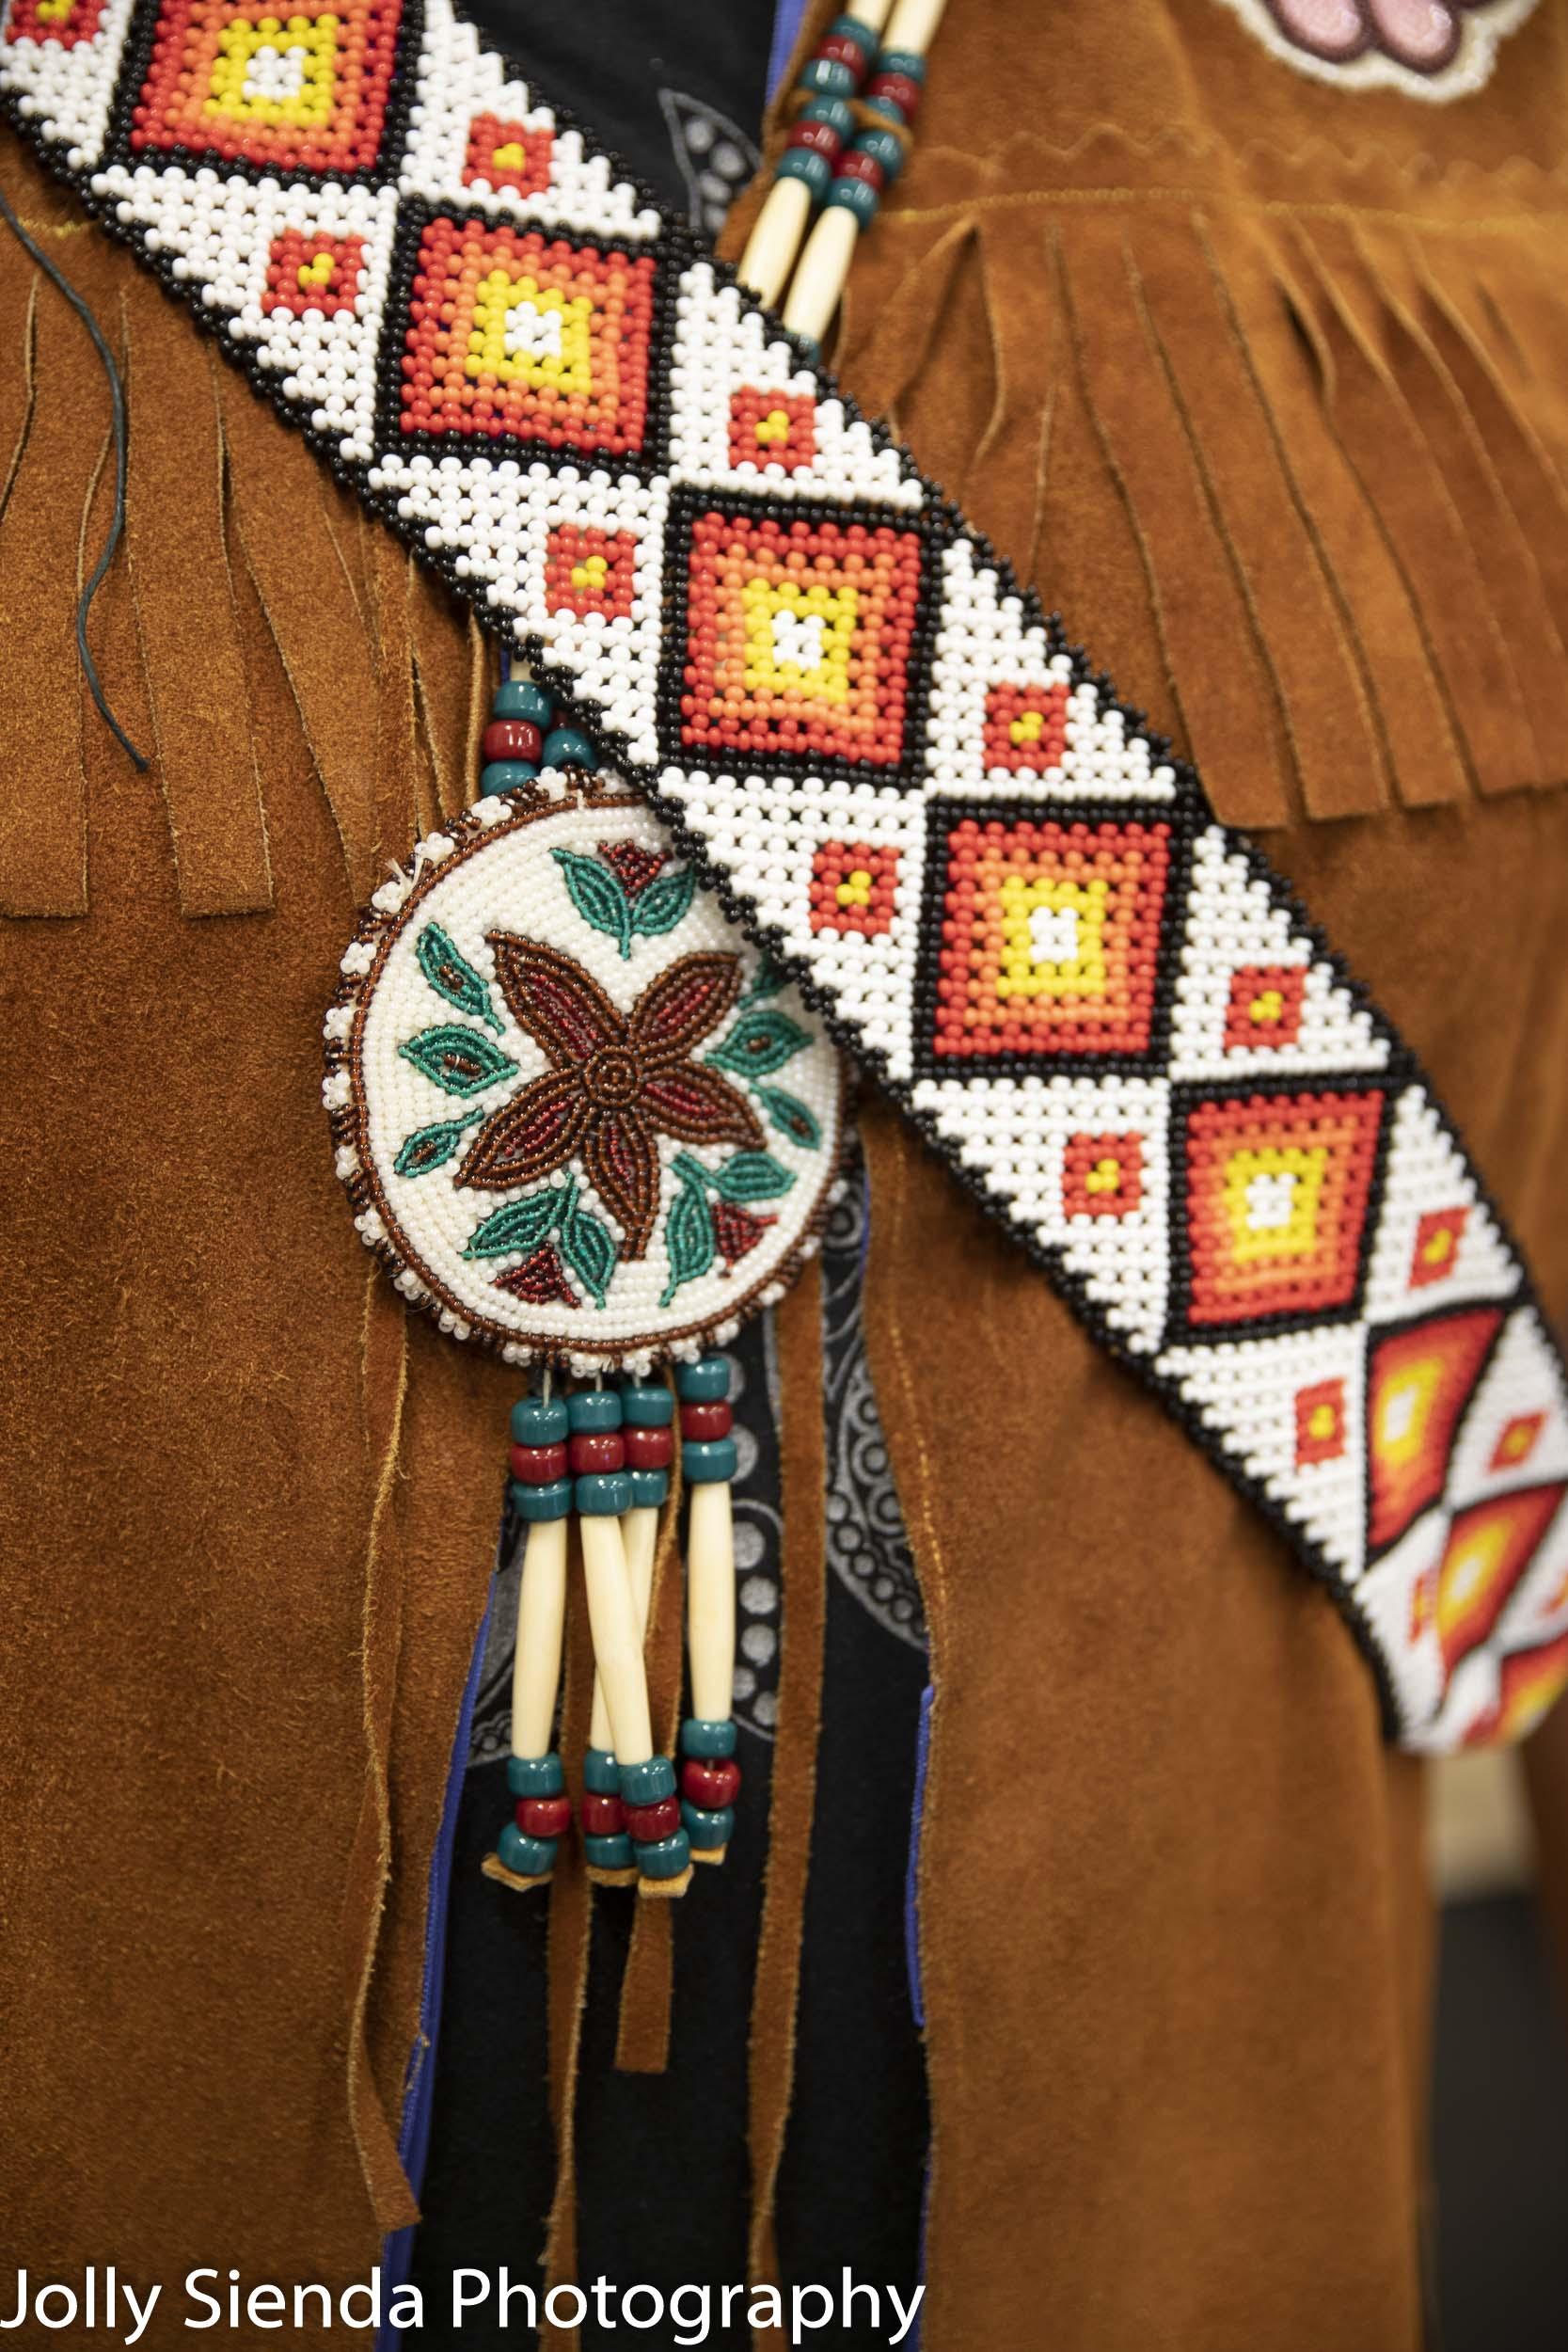 Athabascan native Alaskan beadwork